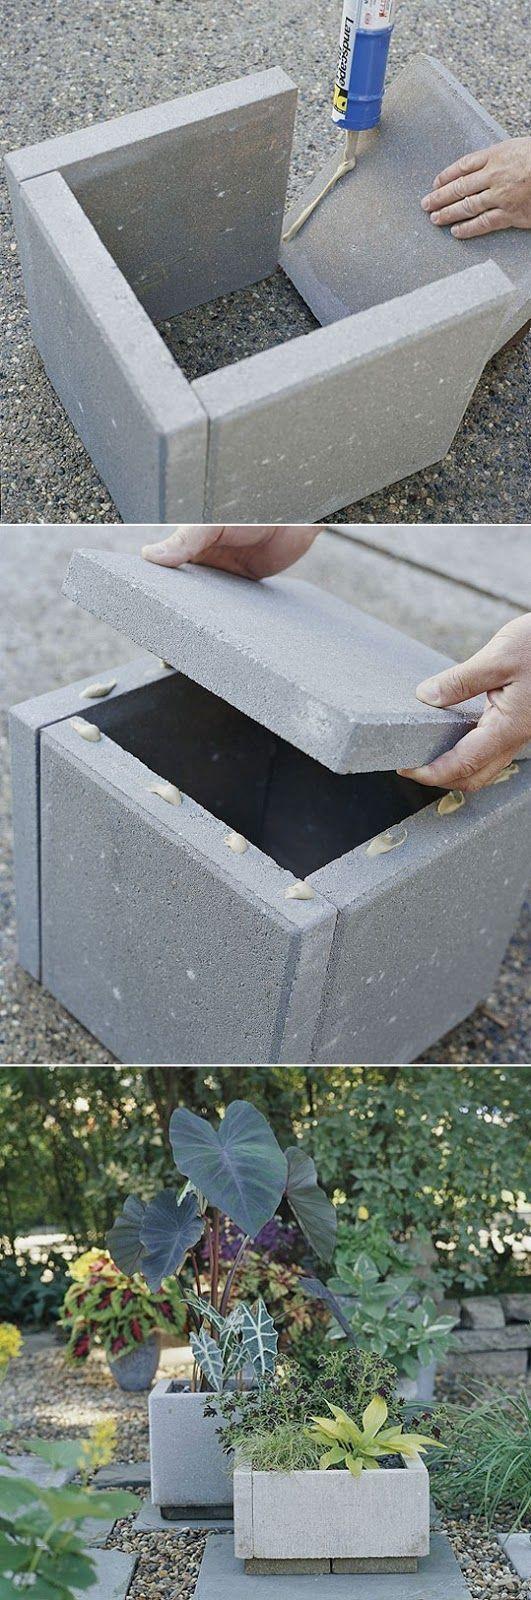 Diy Concrete Planter Box Diy Concrete Planters Outdoor Planters Concrete Planter Boxes